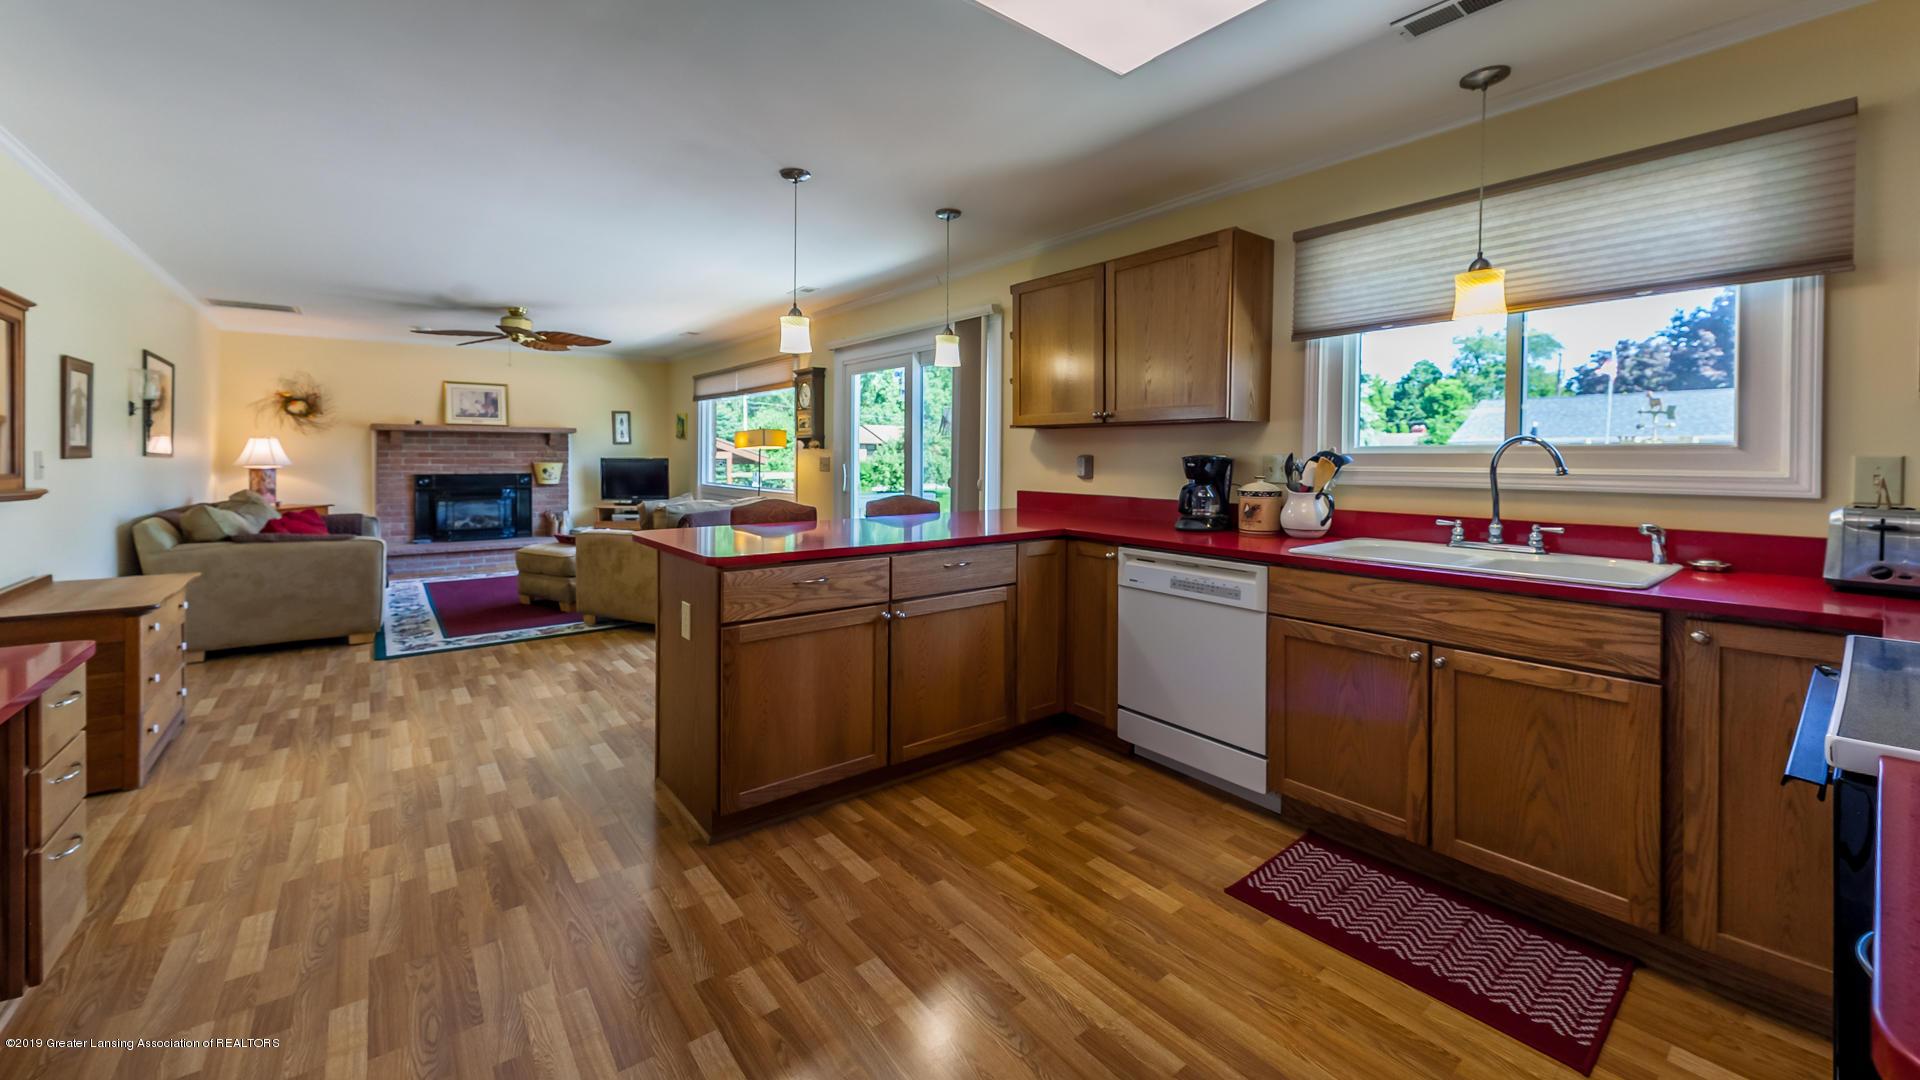 10109 Burgundy Blvd - kitchen to family - 8